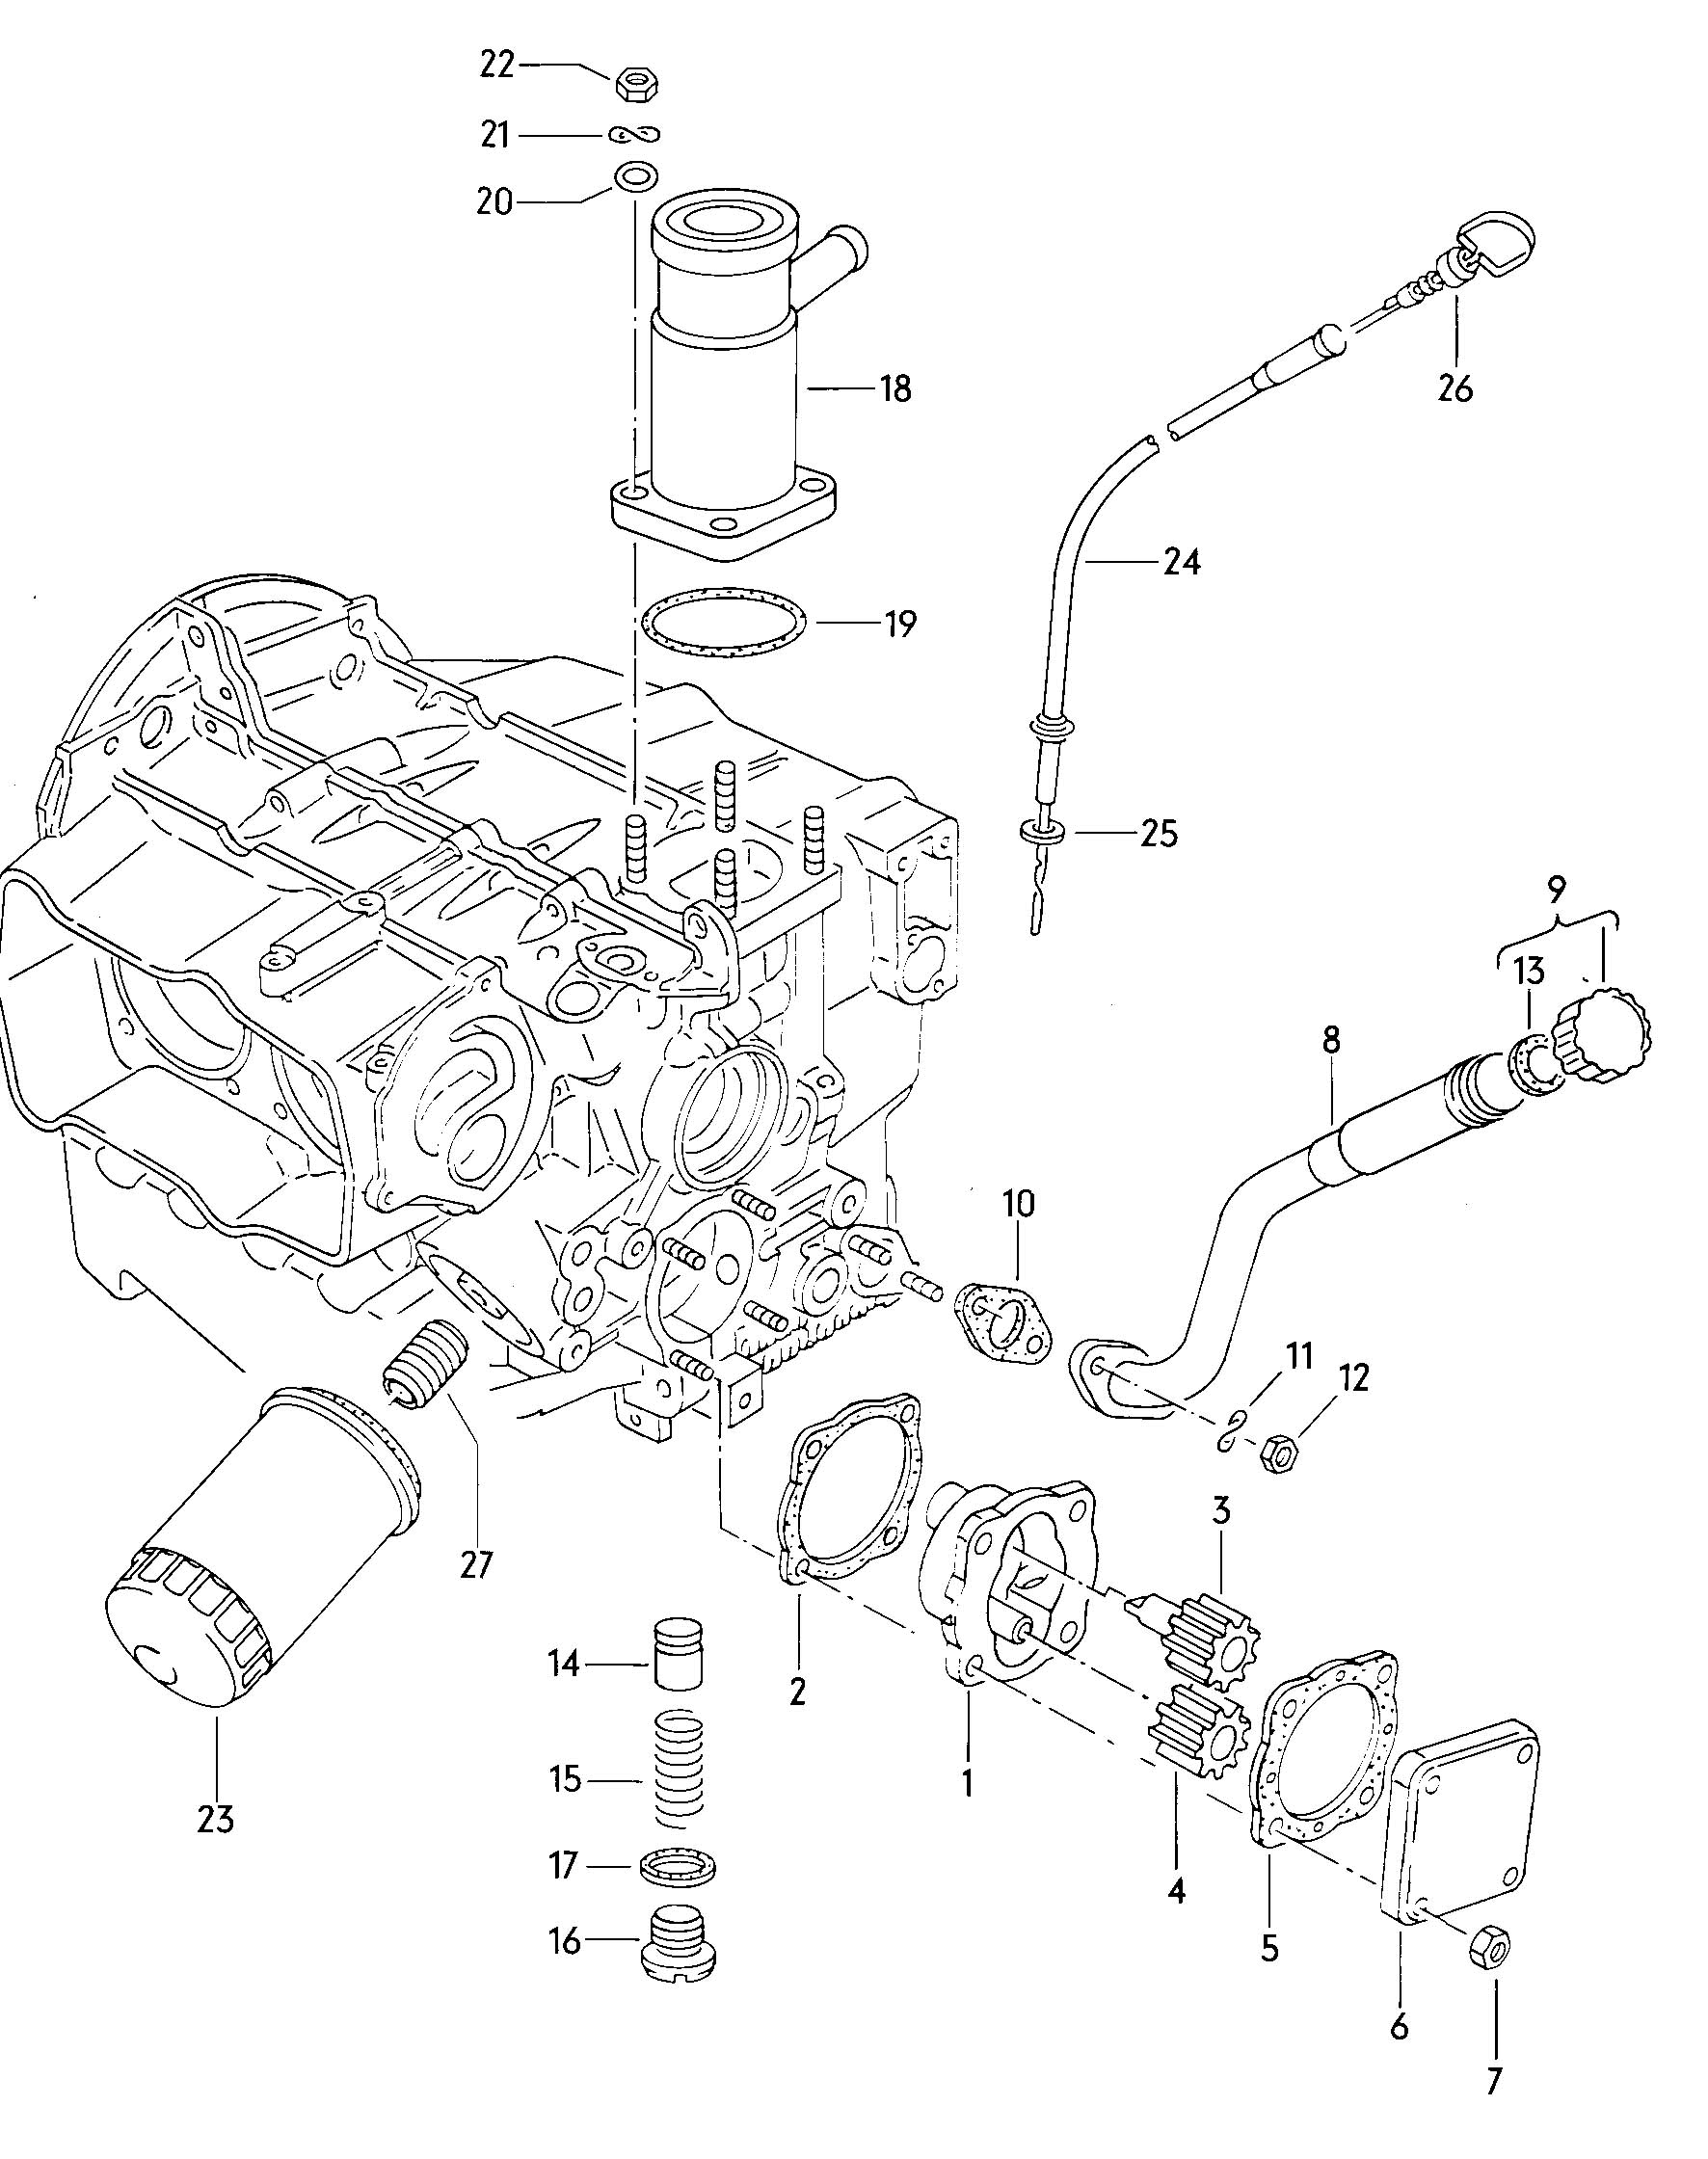 1982 Volkswagen Vanagon Oil filler tube also use:. FILLER